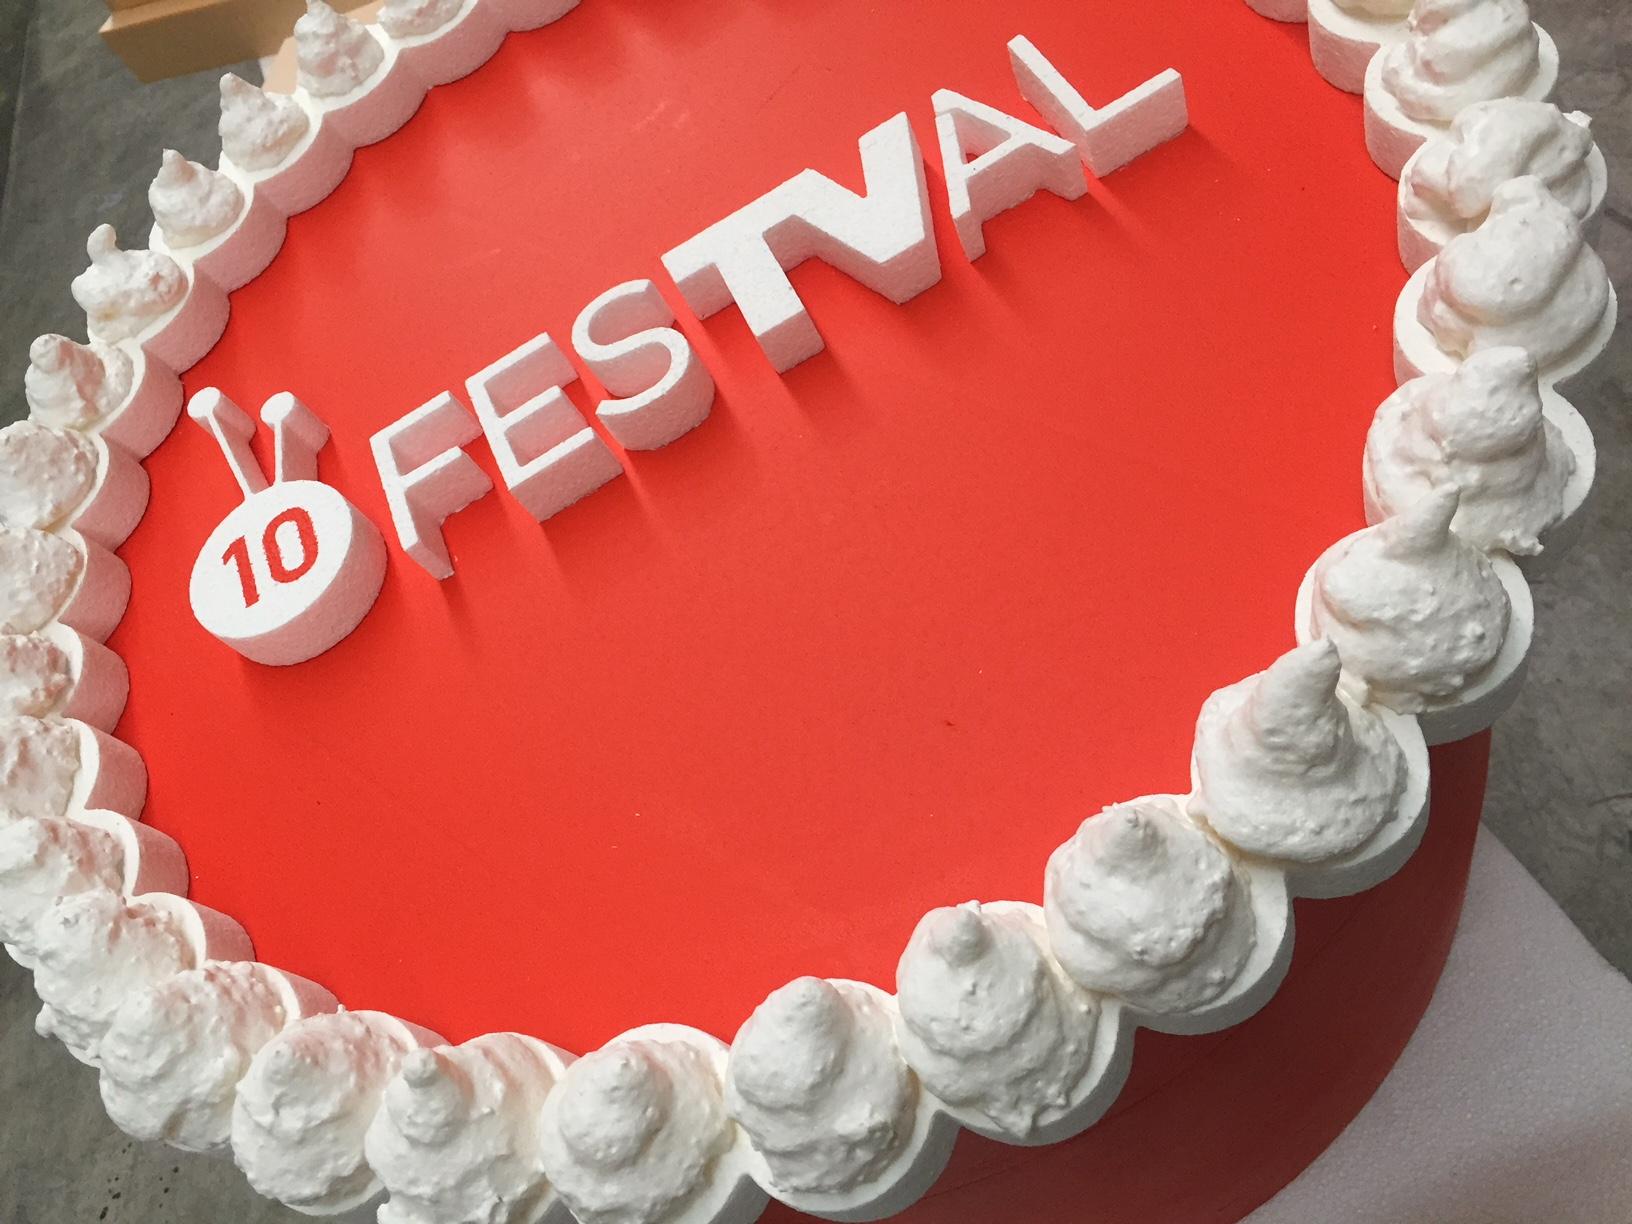 tarta_decoracion_volumen_logo_poliestireno_fiesta_aniversario_cumpleaños